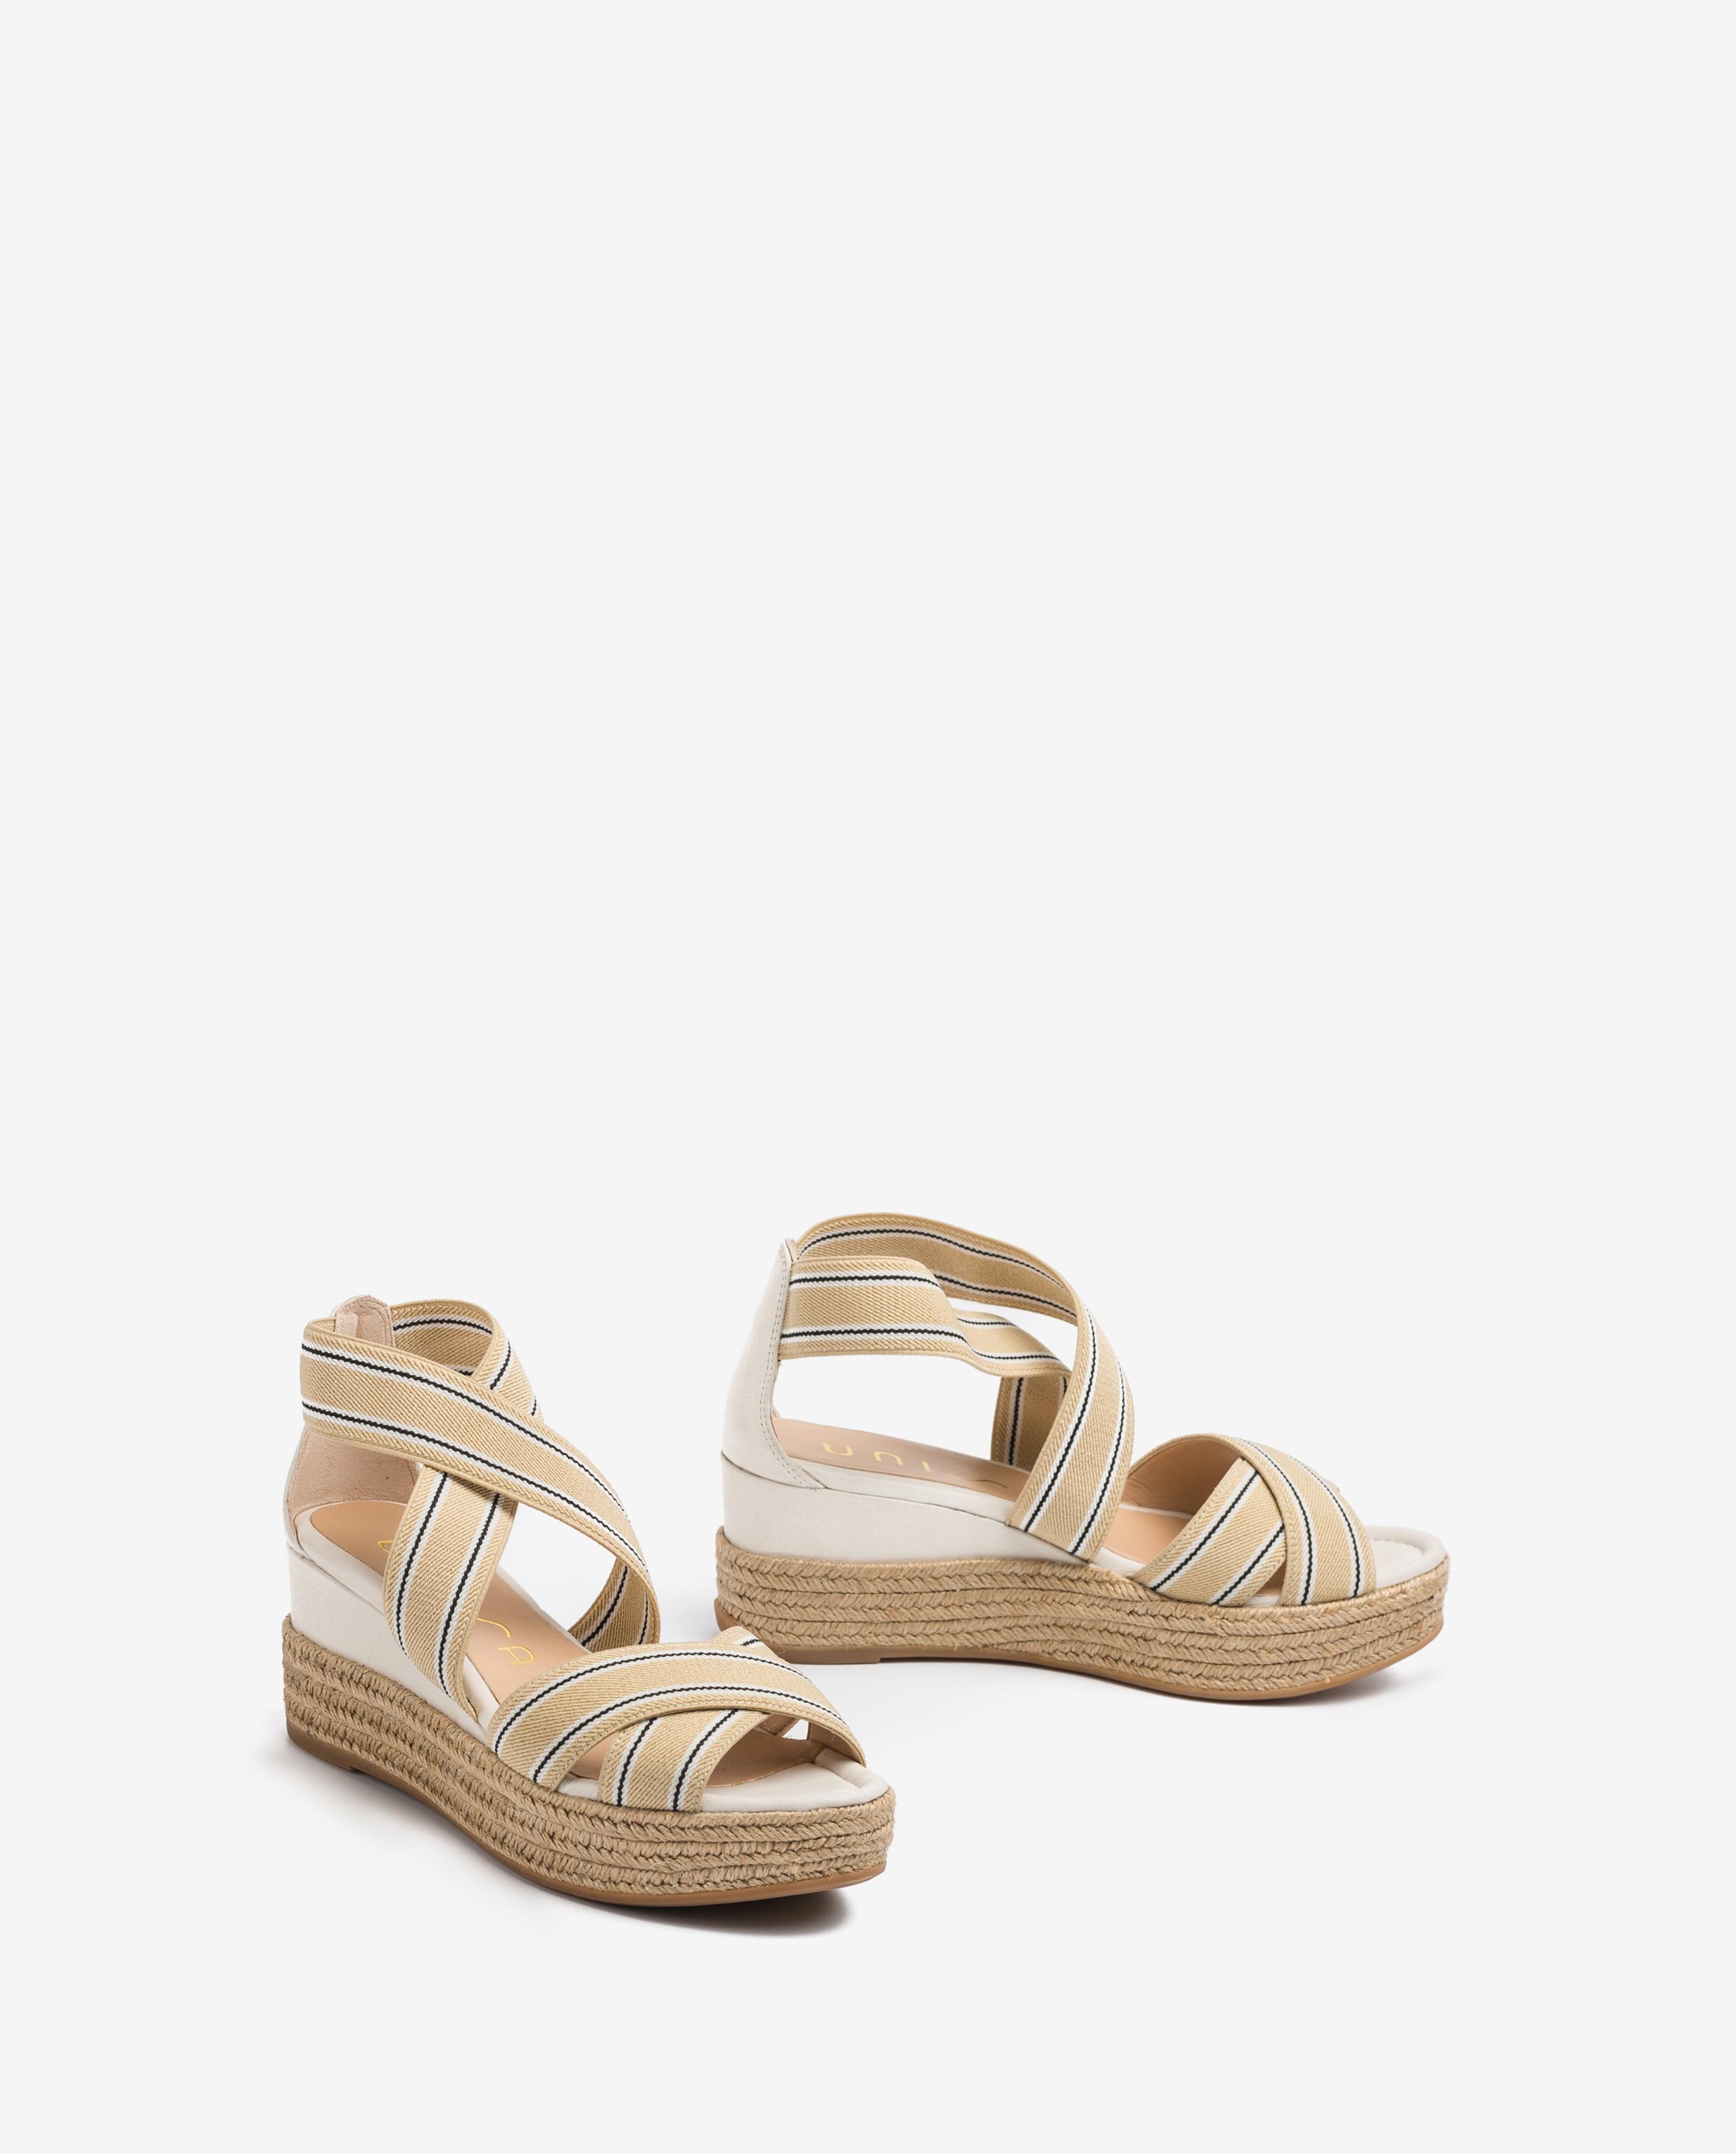 UNISA Striped straps sandals KADUR_CAN ivory 2